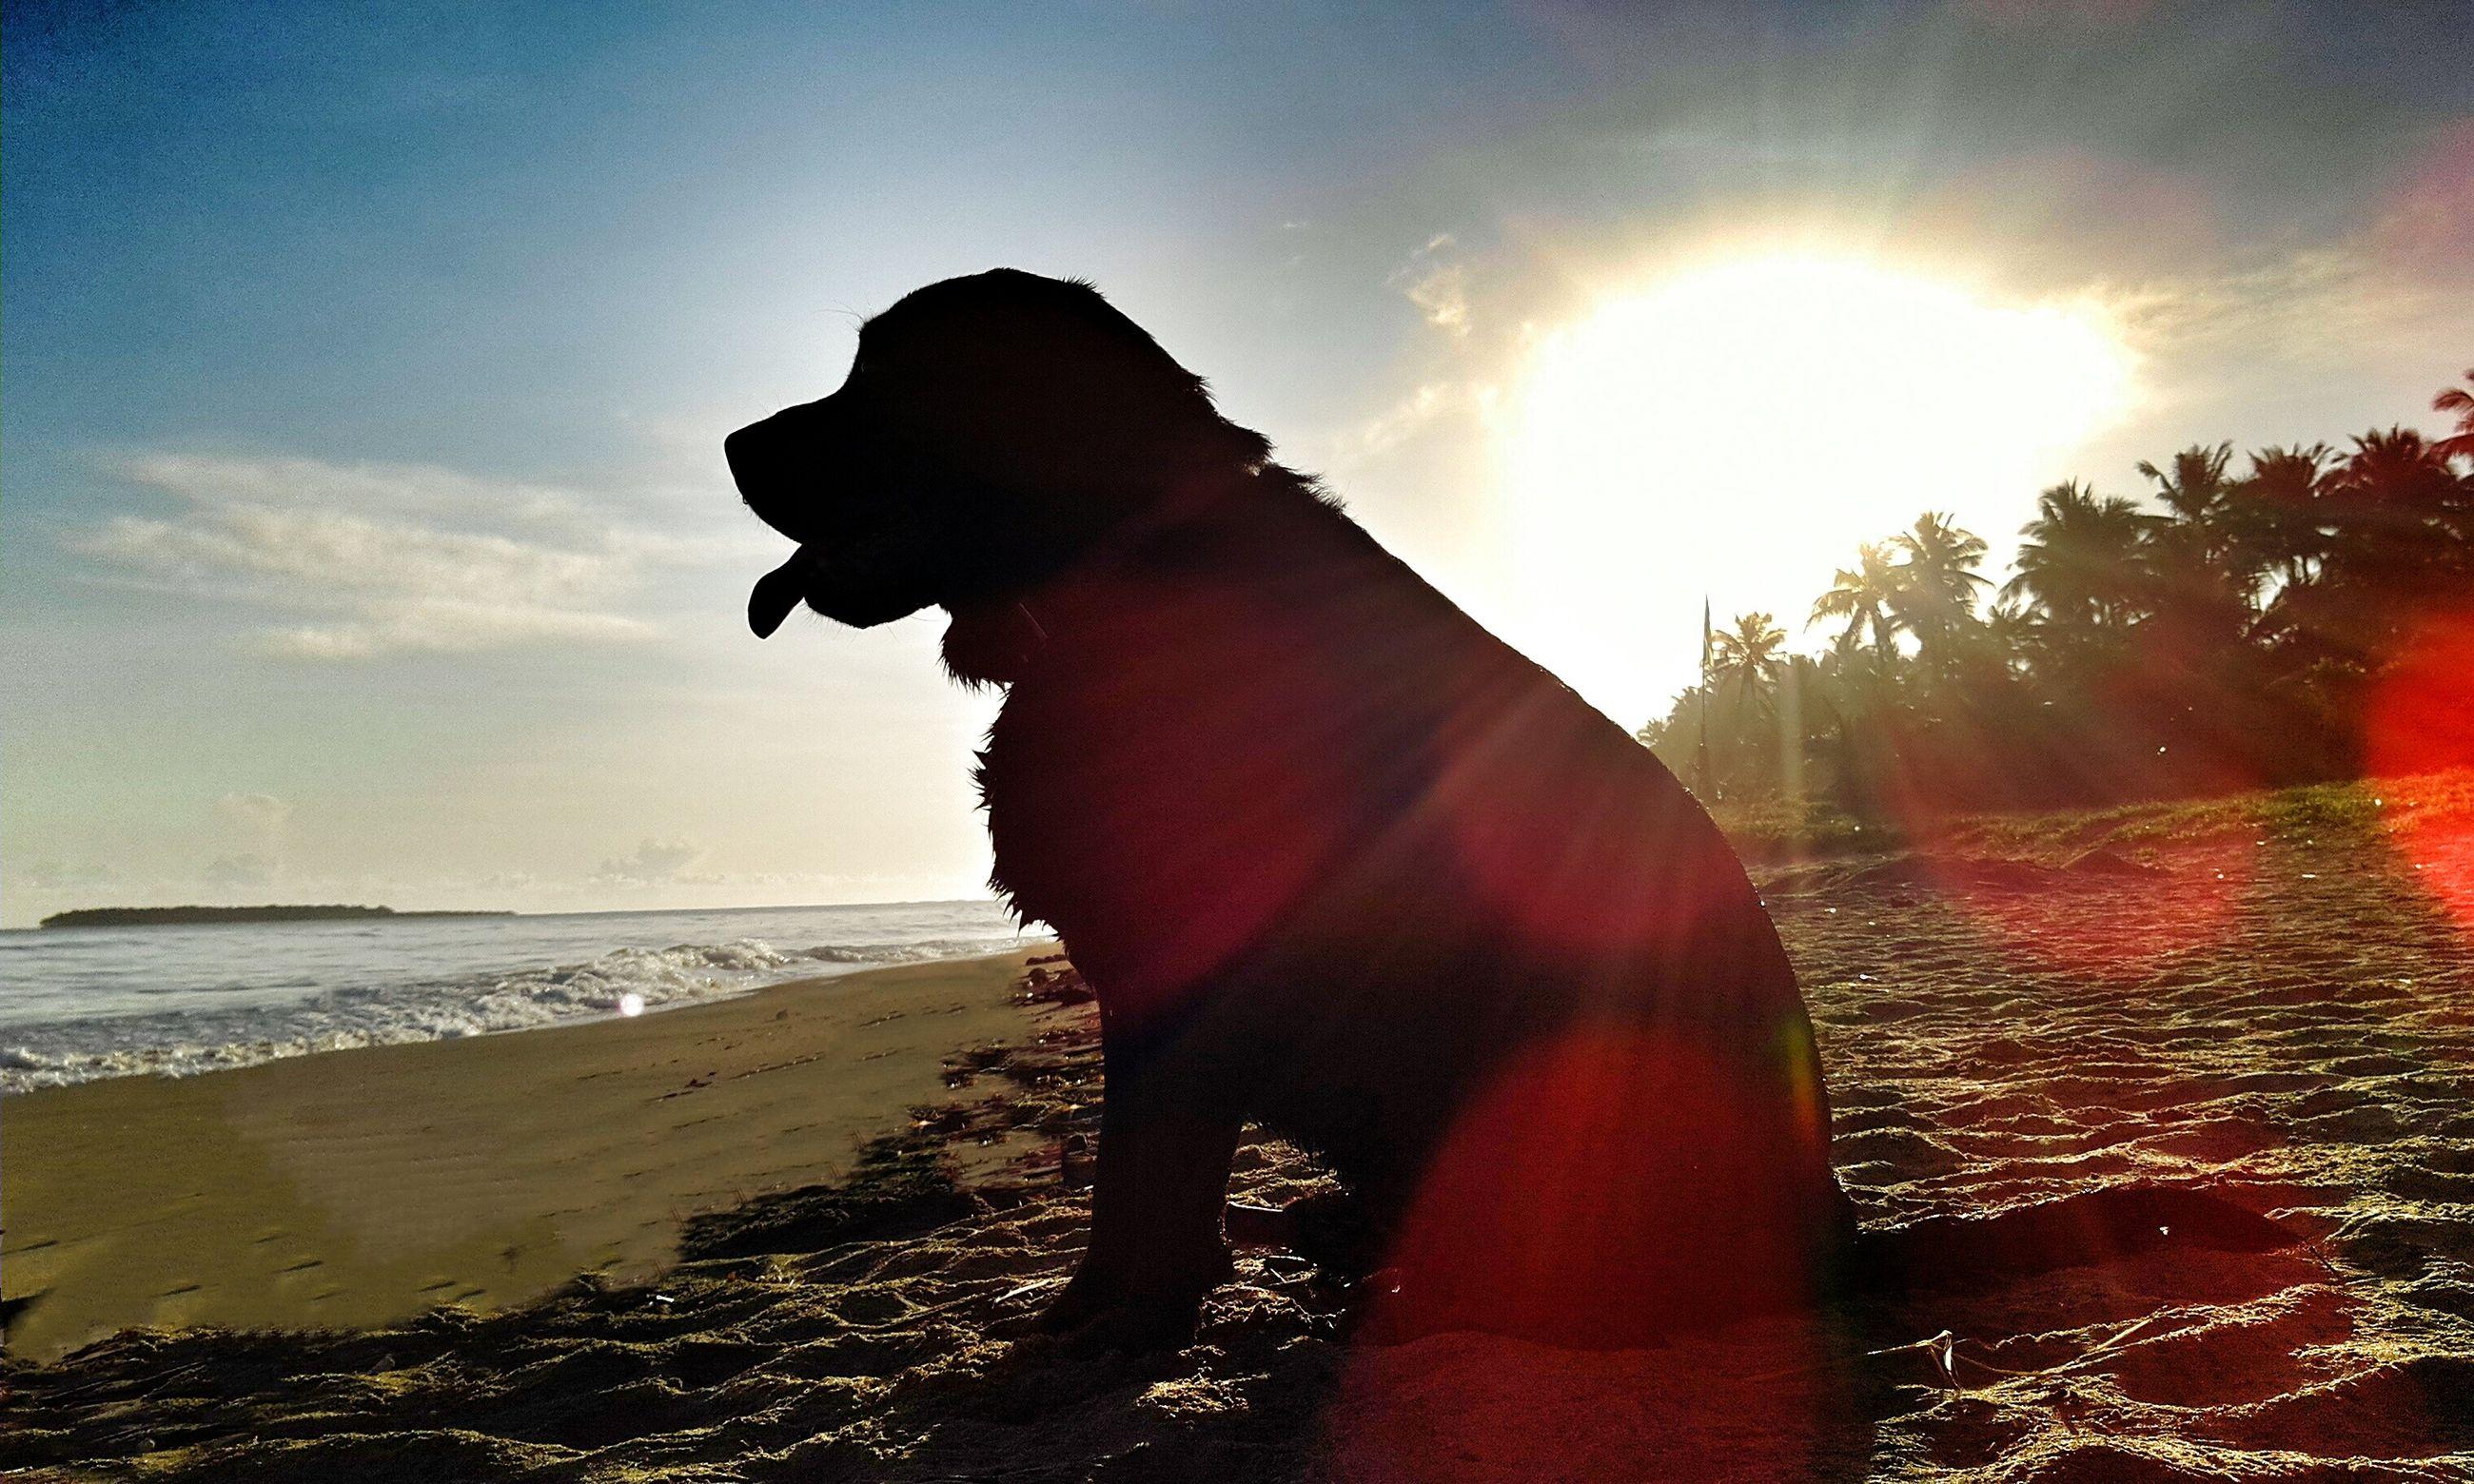 sun, beach, sunlight, sunbeam, sky, sea, lens flare, water, sunset, horizon over water, sand, shore, sunny, nature, beauty in nature, scenics, tranquility, cloud - sky, tranquil scene, outdoors